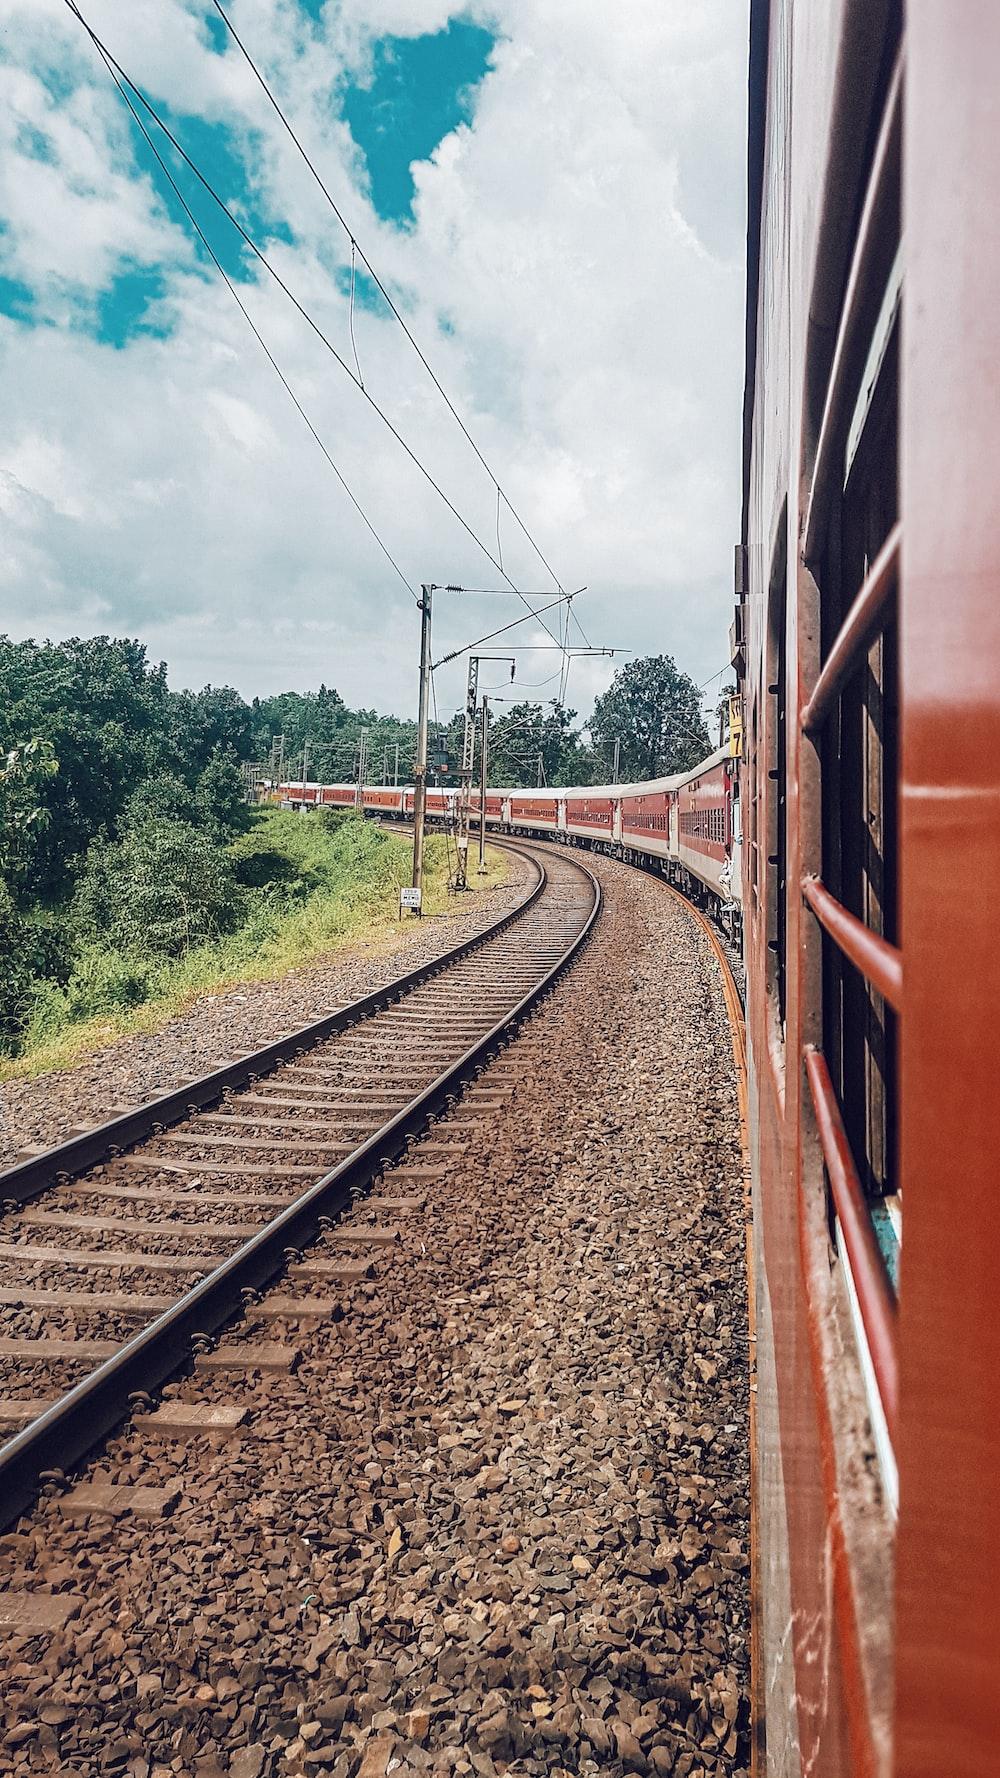 brown metal train rail near green trees during daytime